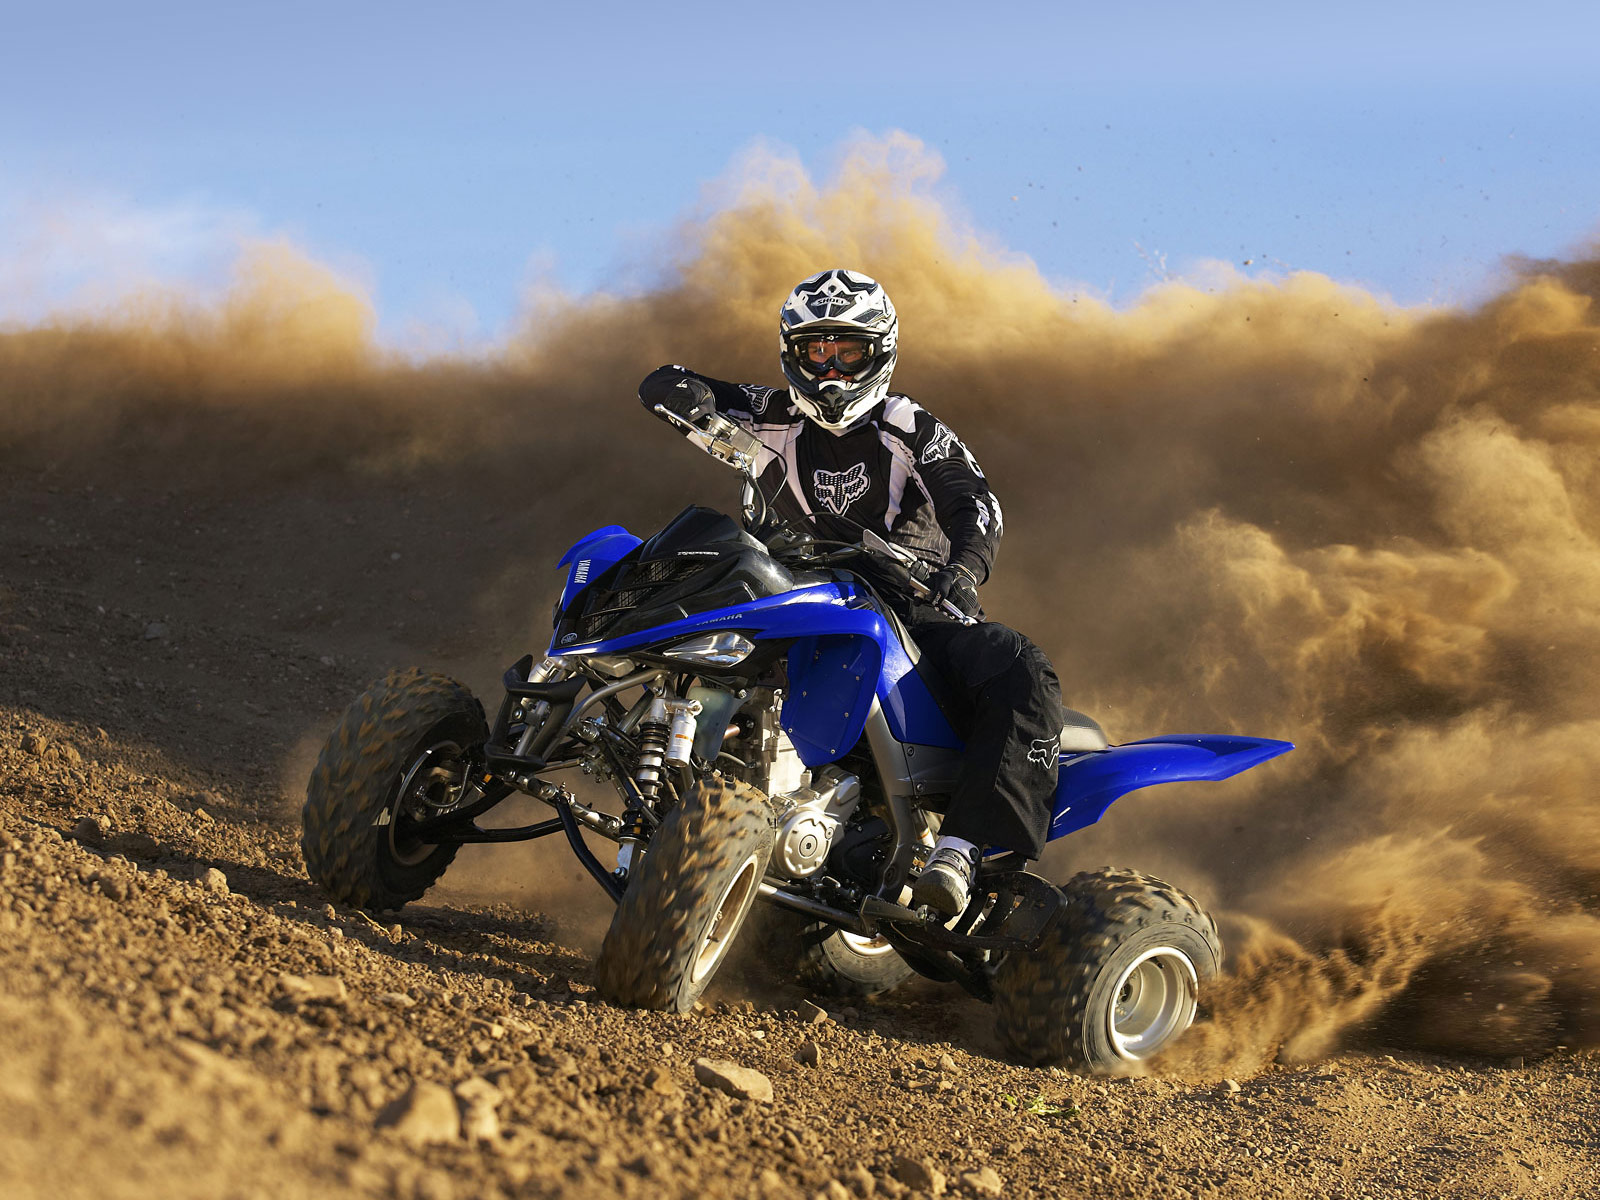 2011 YAMAHA Raptor 700R ATV pictures 2 1600x1200